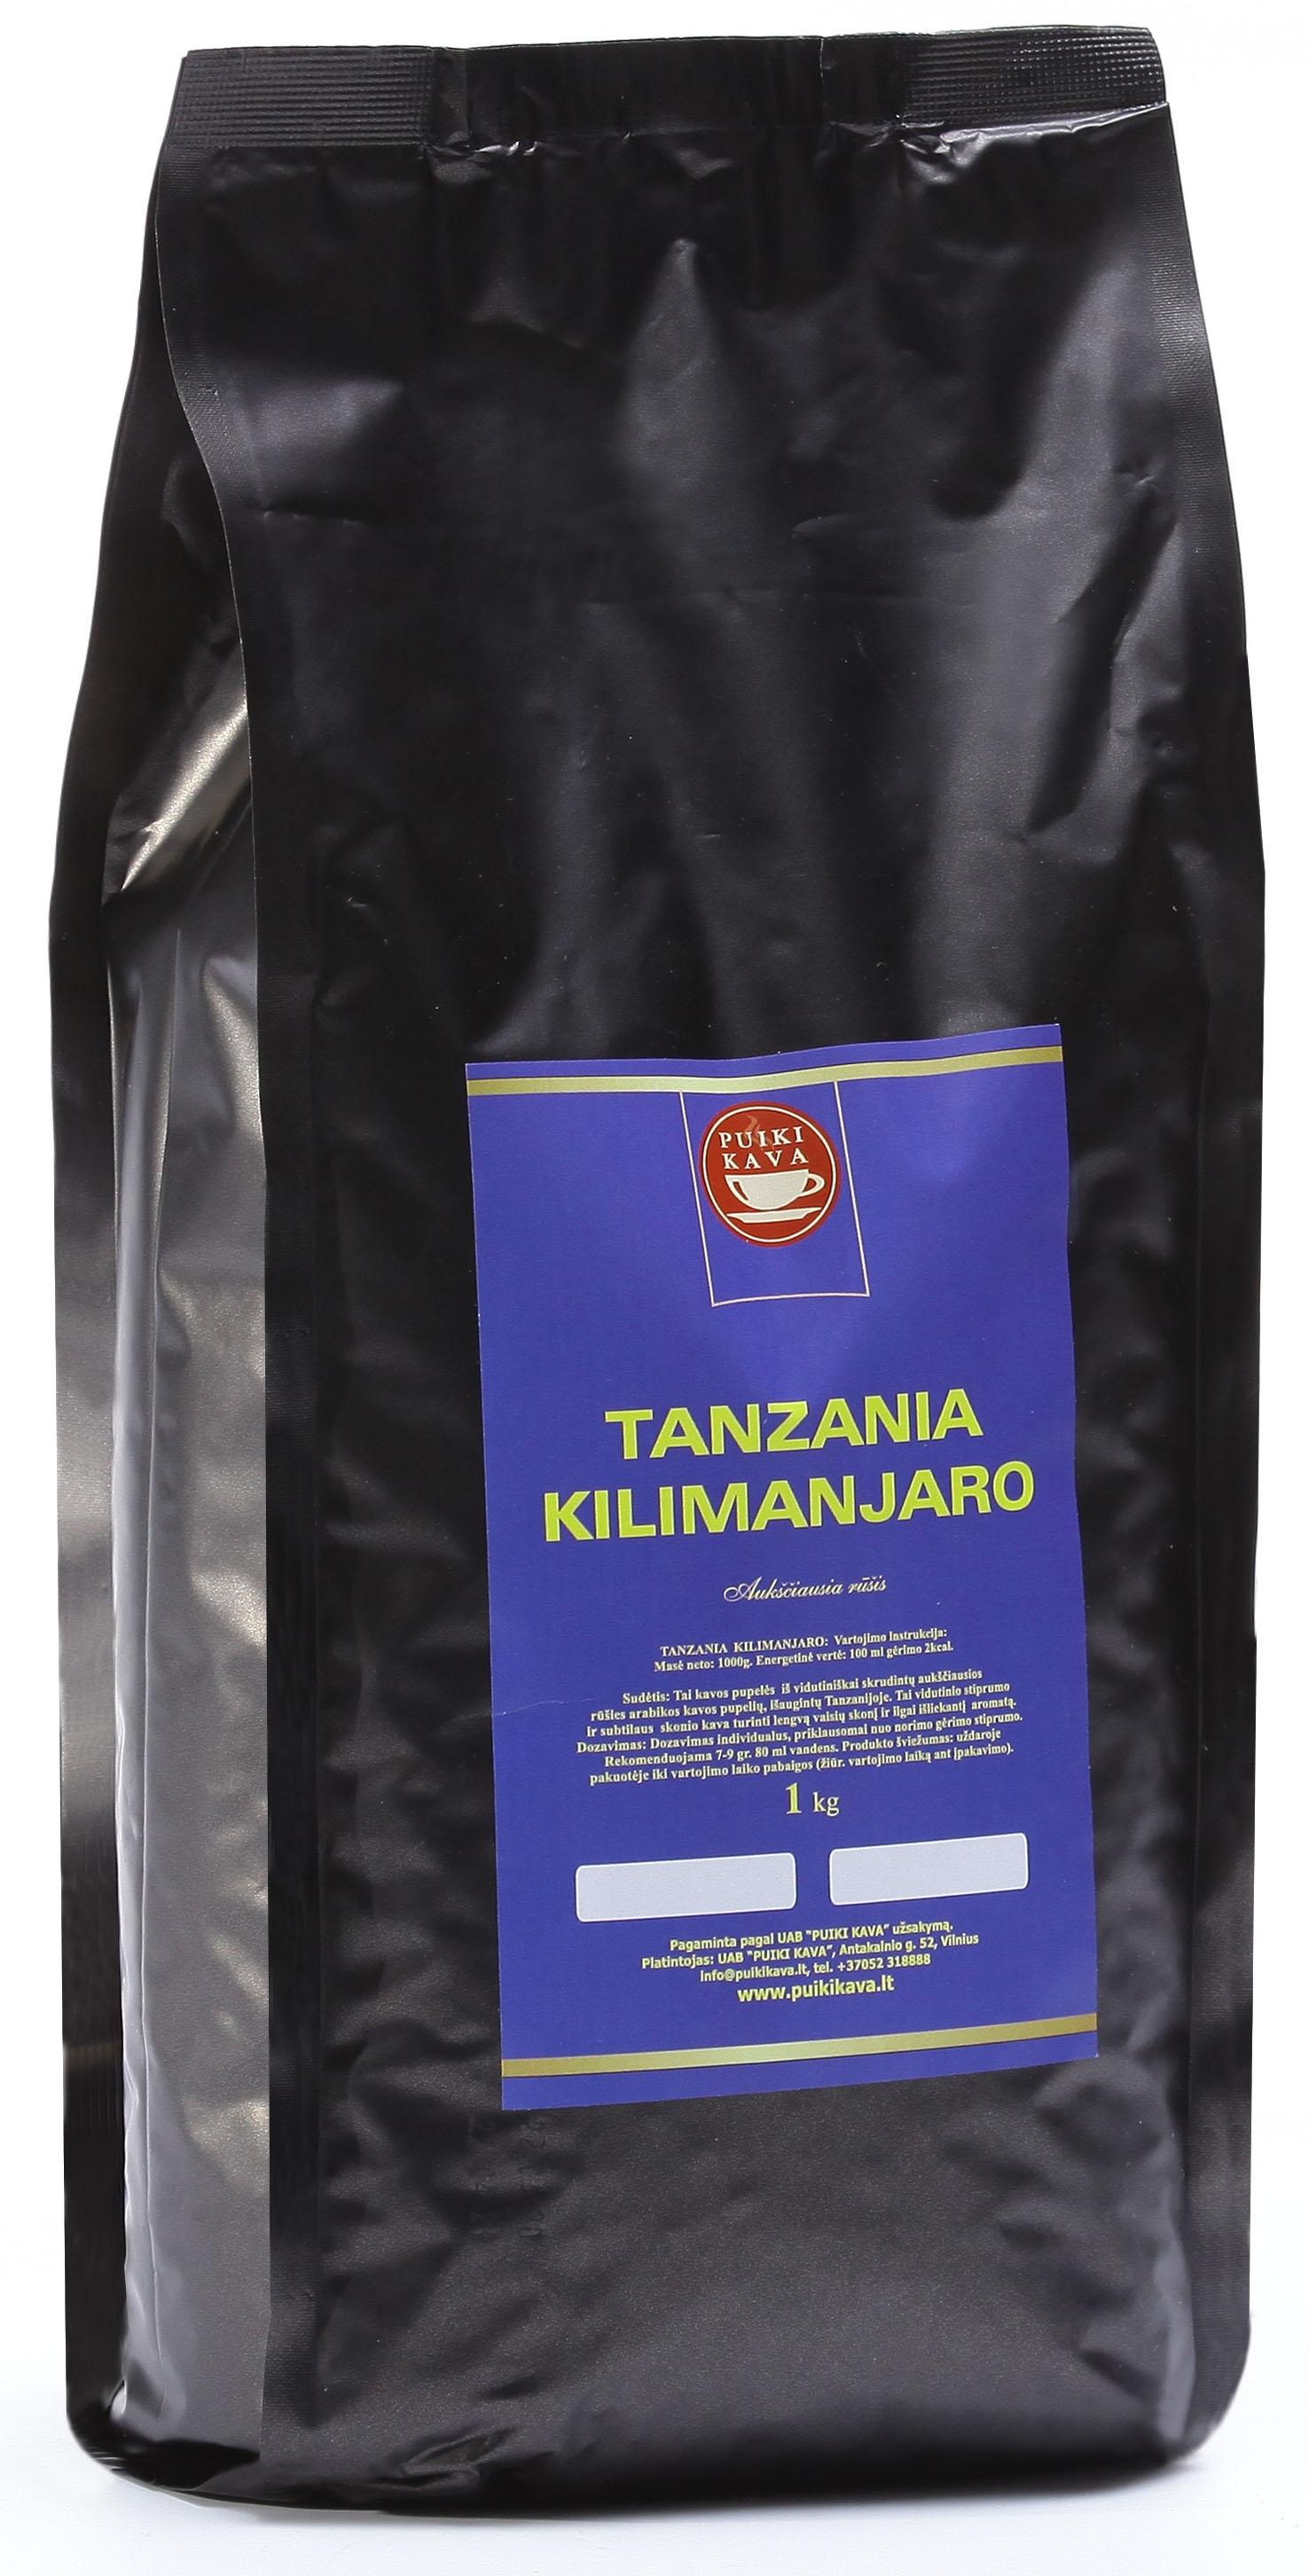 TANZANIA KILIMANJARO (1kg)